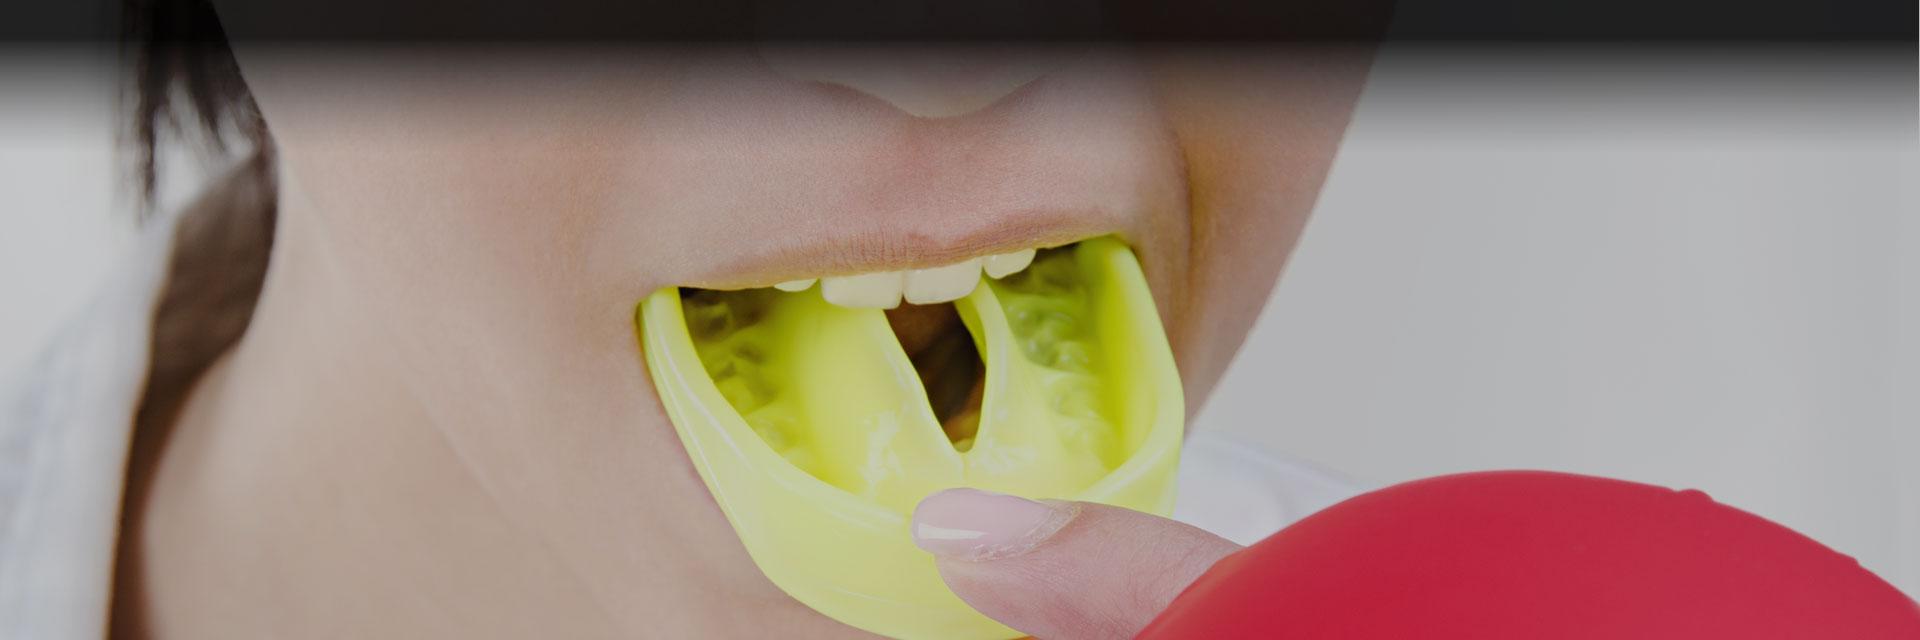 Young boxing woman using mouthguard